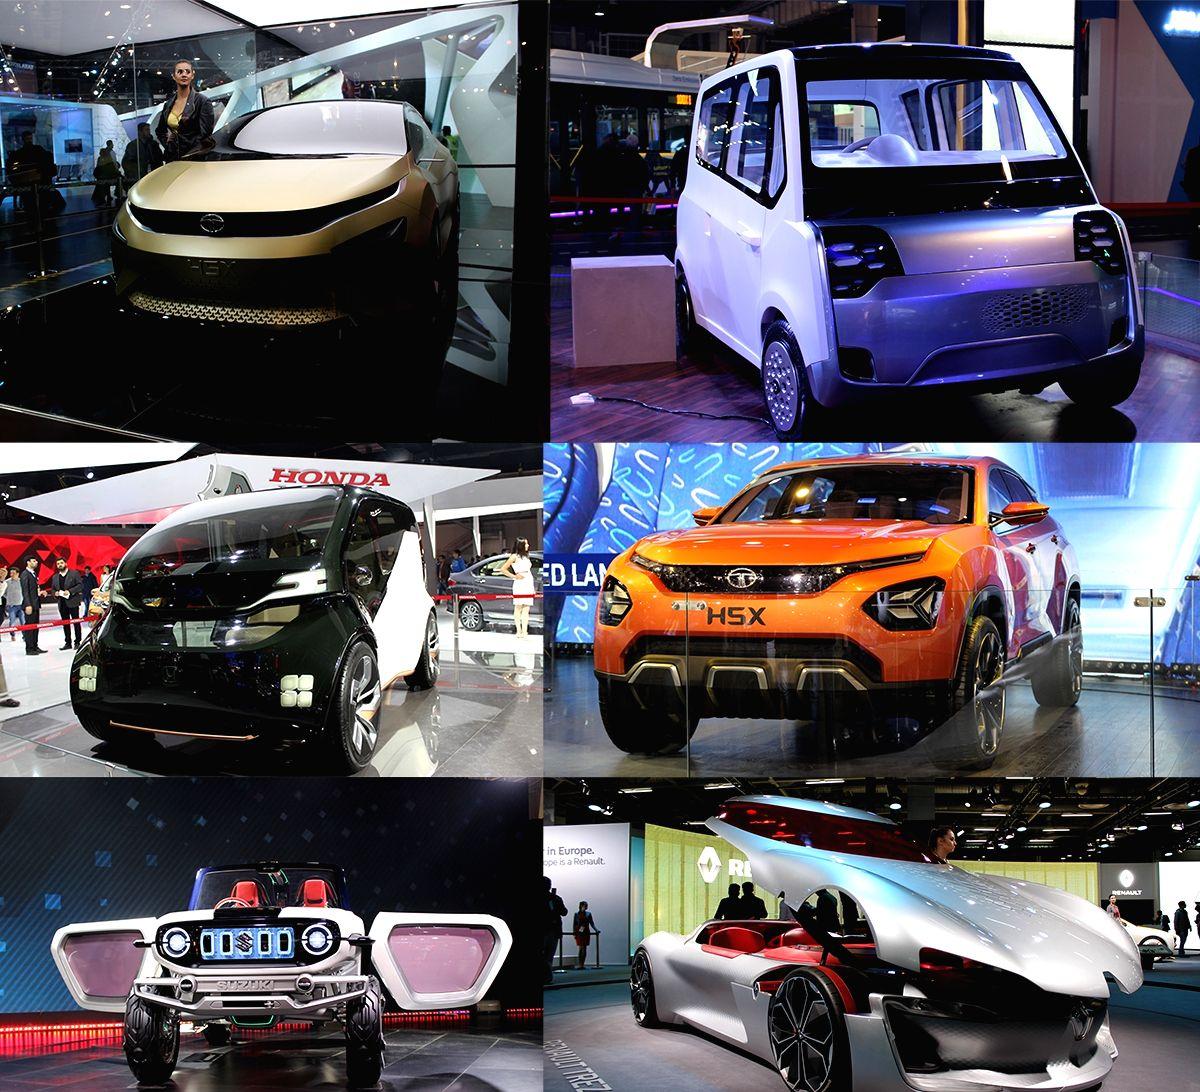 Auto Expo - companies participate